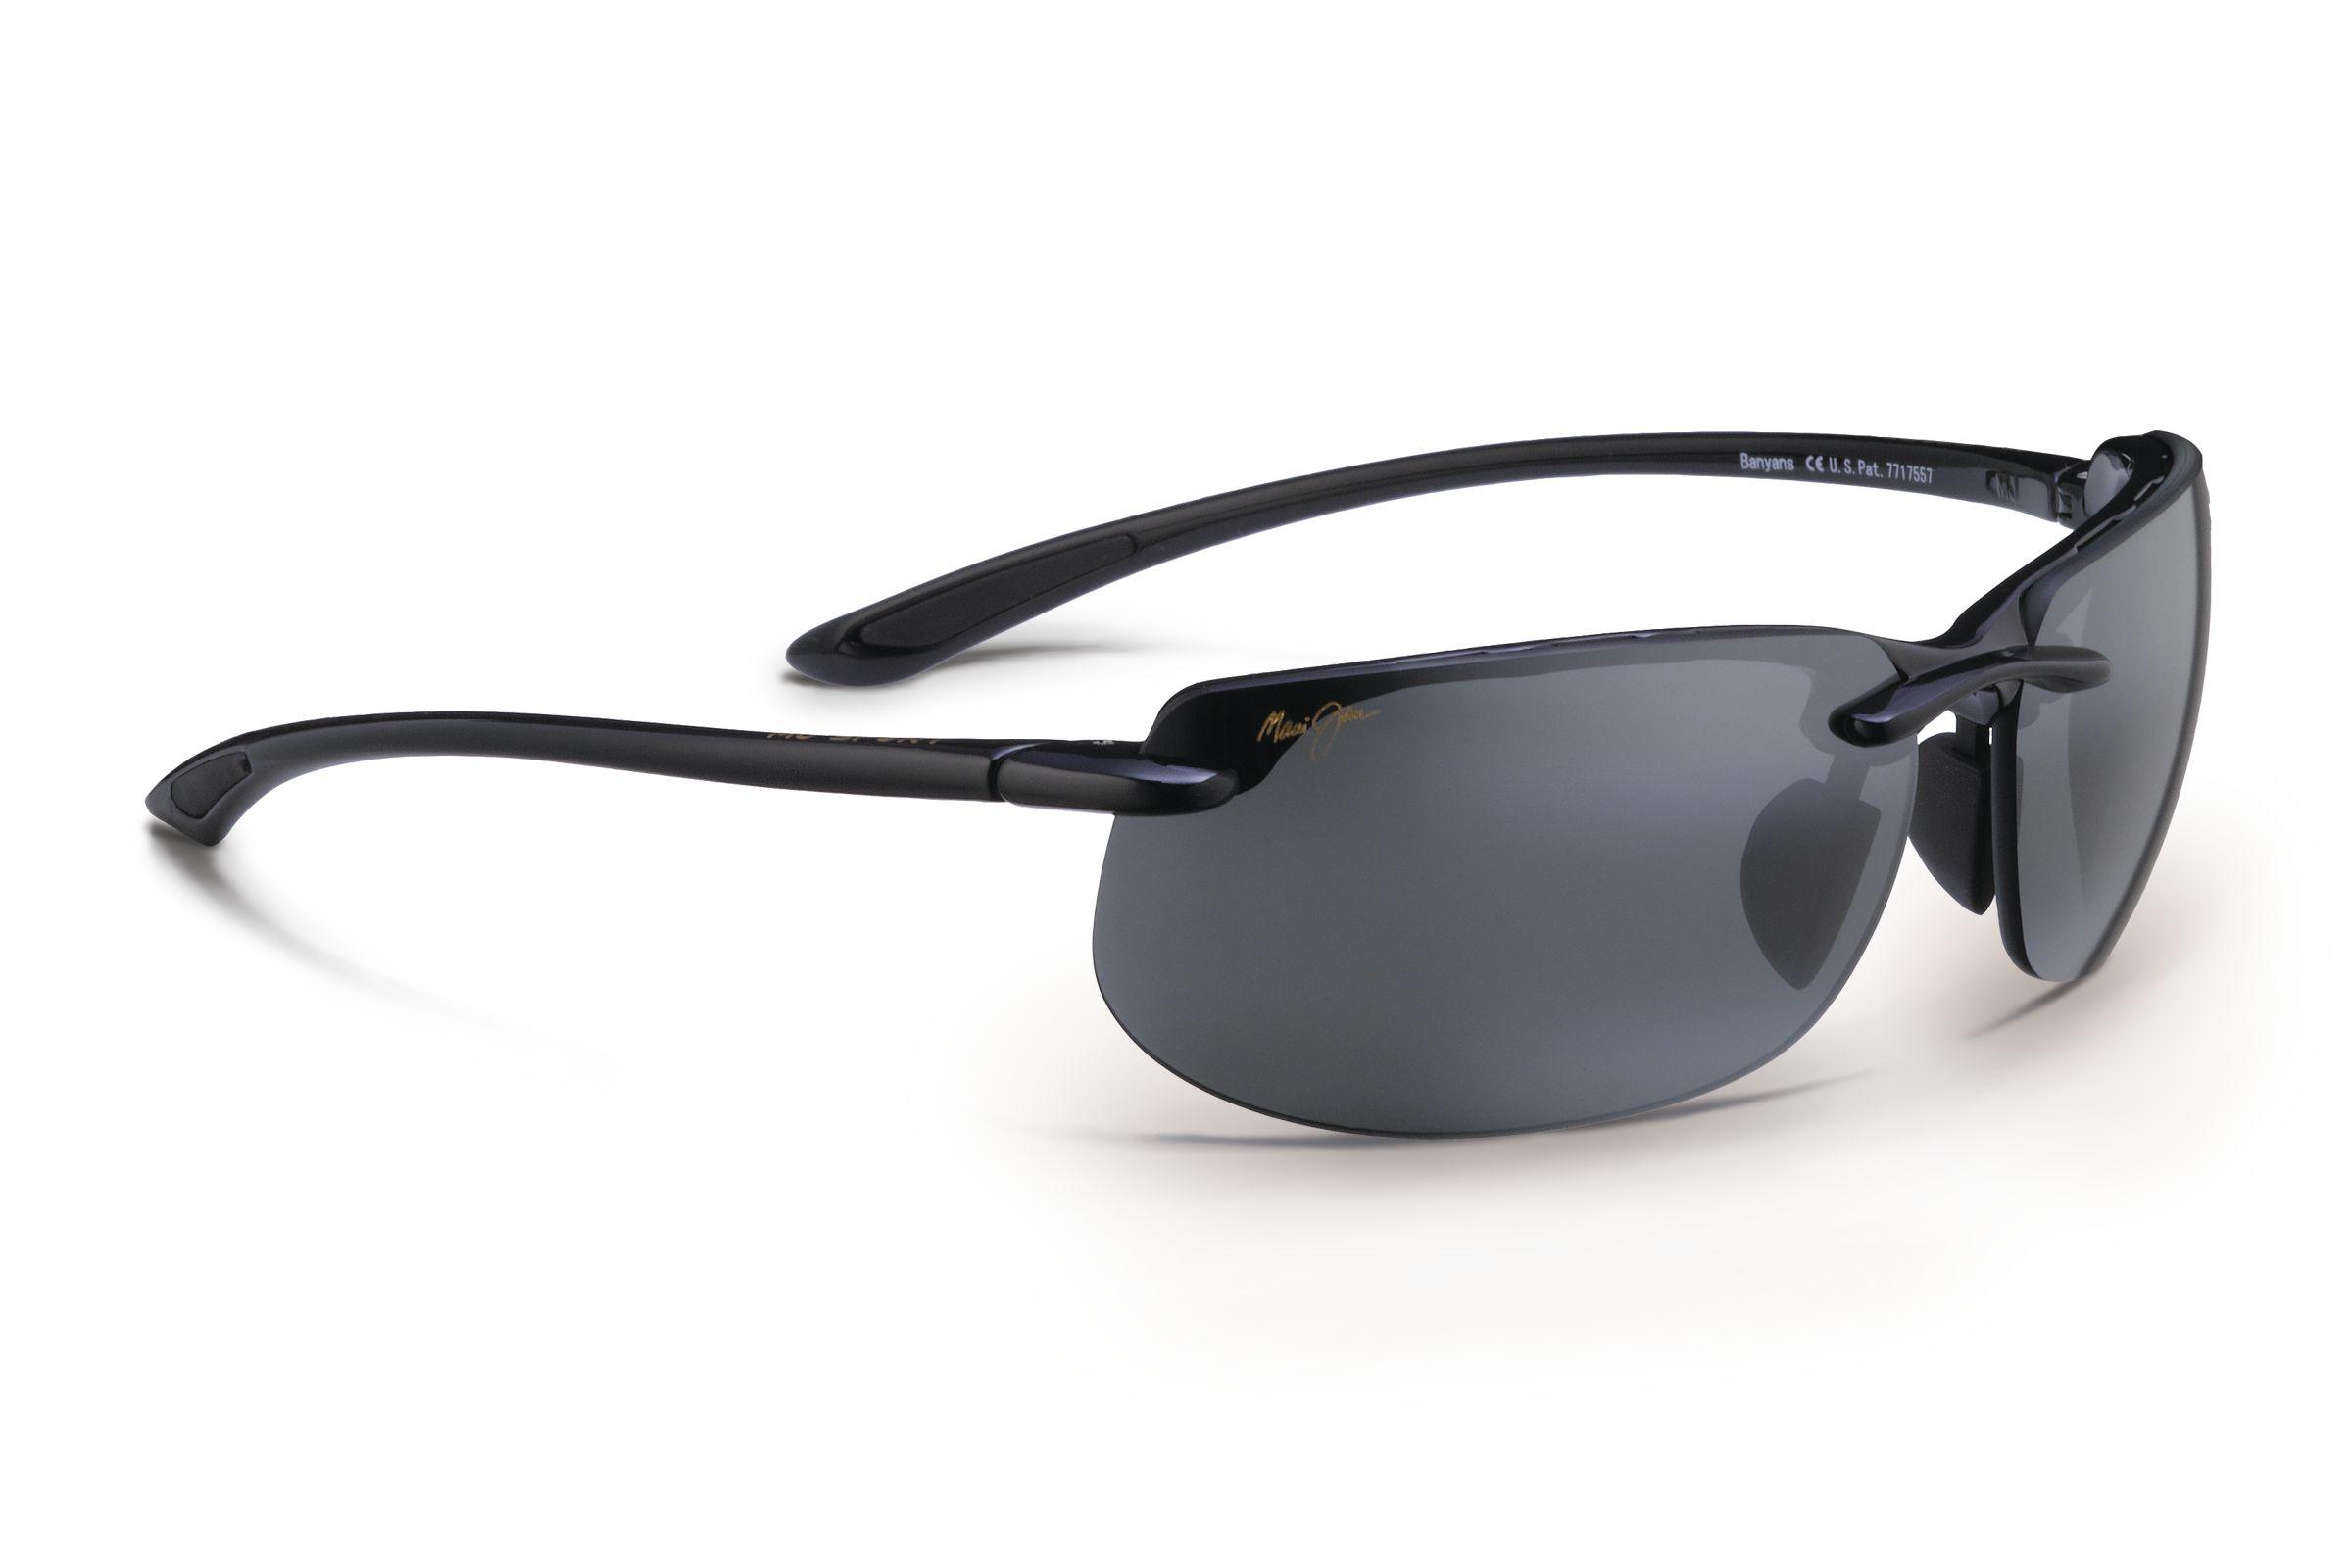 a50279fbc826 Maui Jim Banyans Sunglasses | Customer Rated w/ Free Shipping